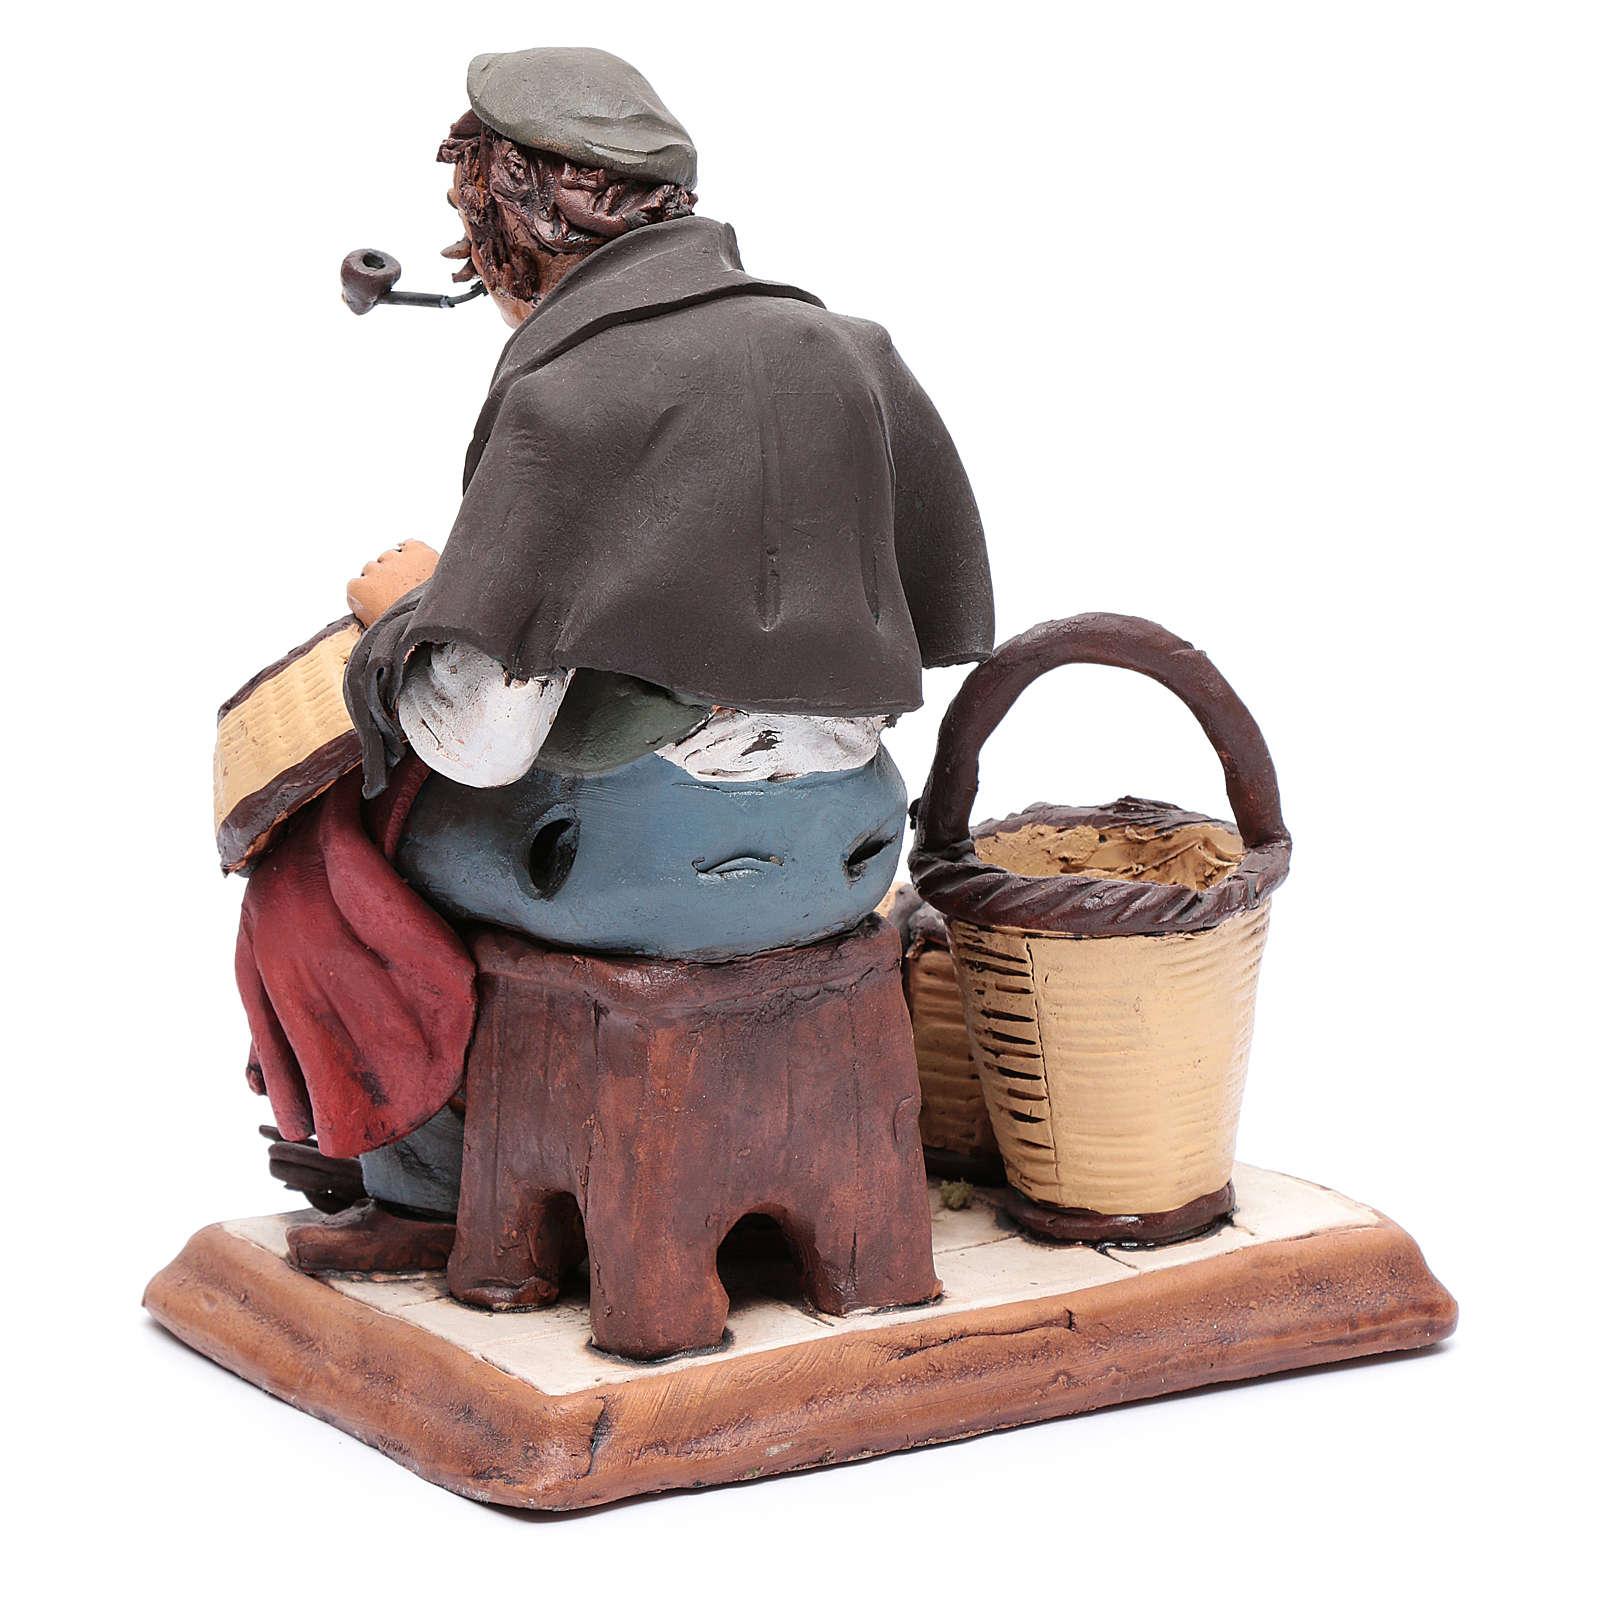 Uomo aggiusta ceste terracotta presepe Deruta 30 cm 4